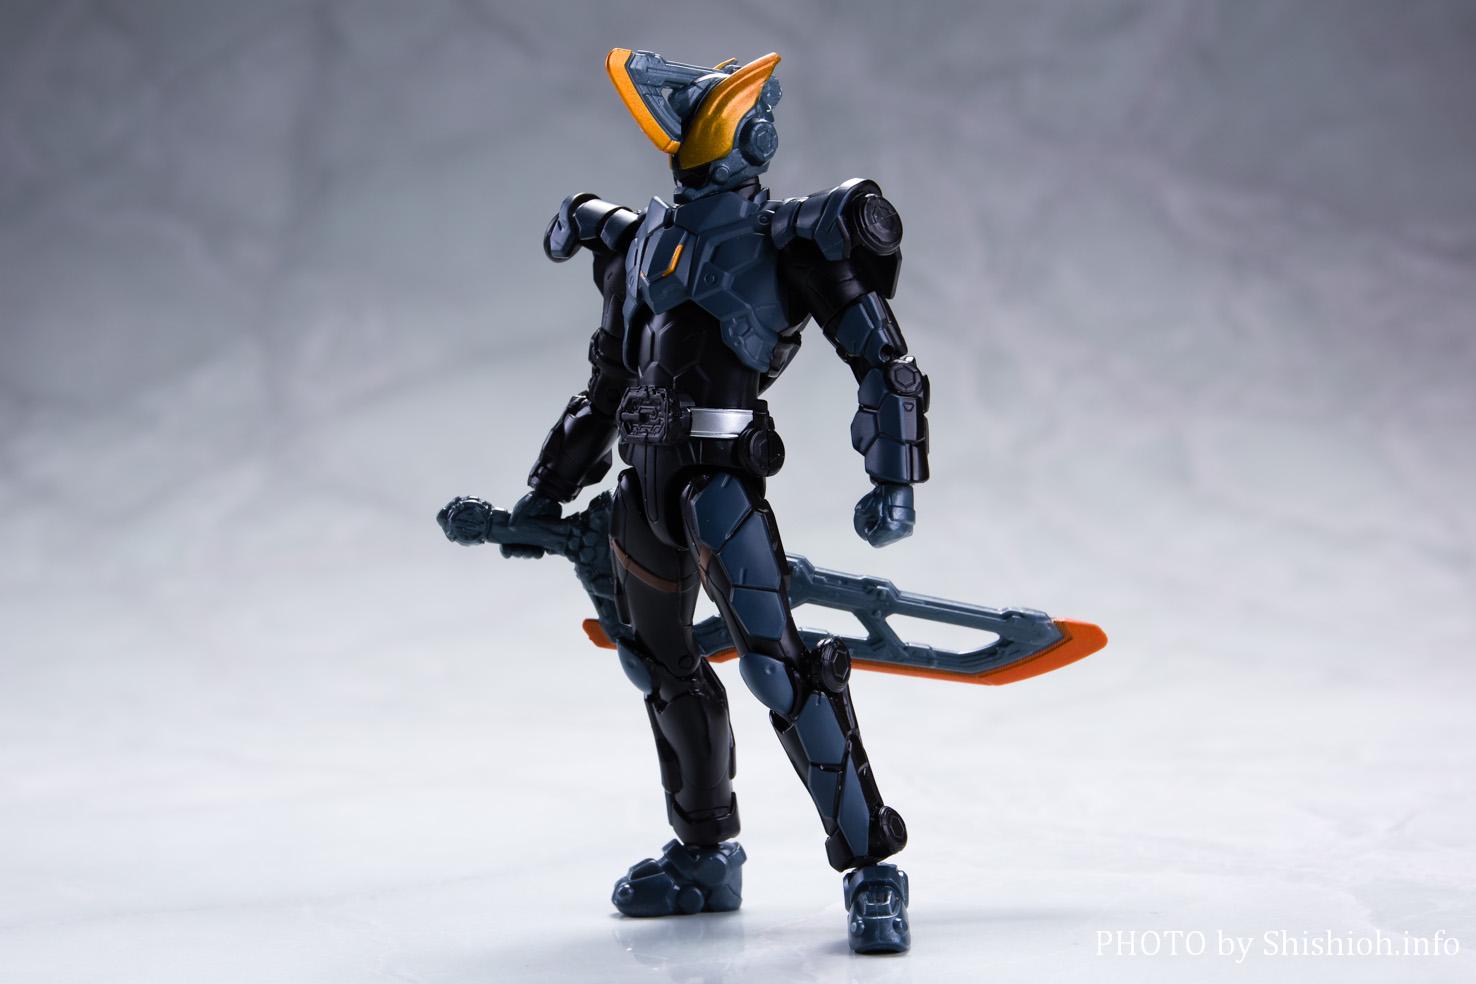 RKF 仮面ライダーバスター 玄武神話&玄武ジャッ君 フォームチェンジセット